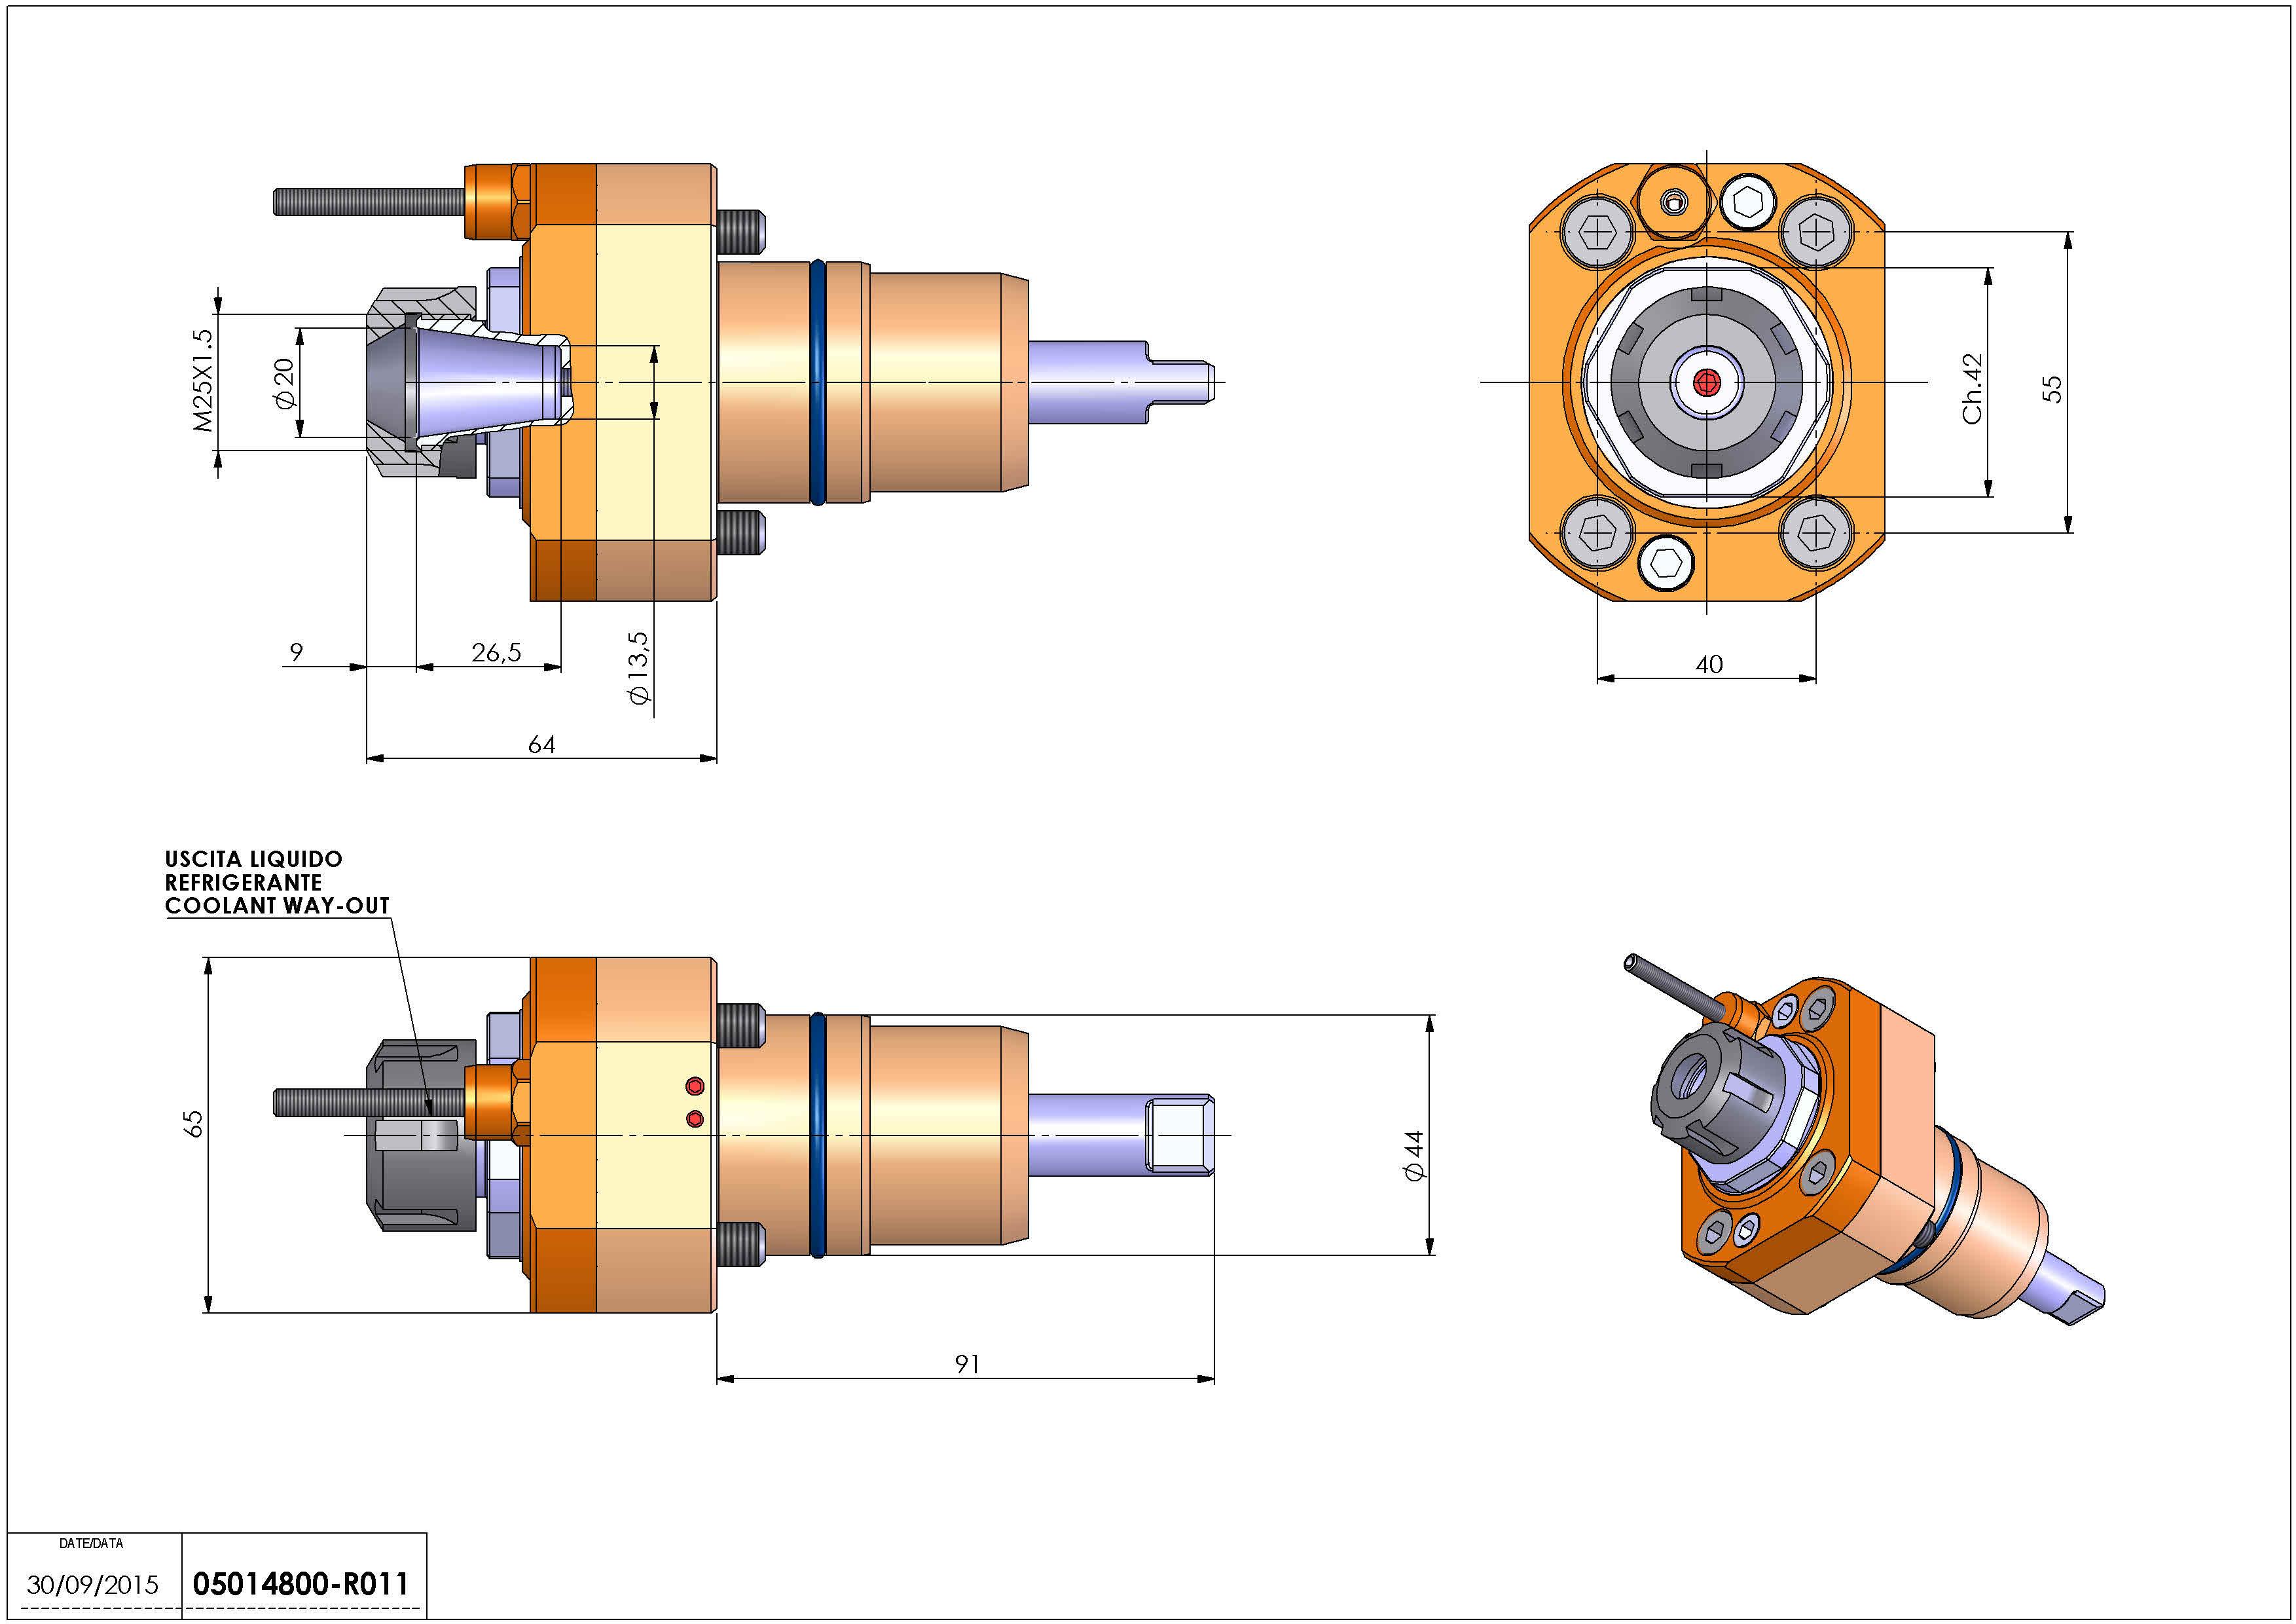 Technical image - LT-S D44 ER20 H64 NK.